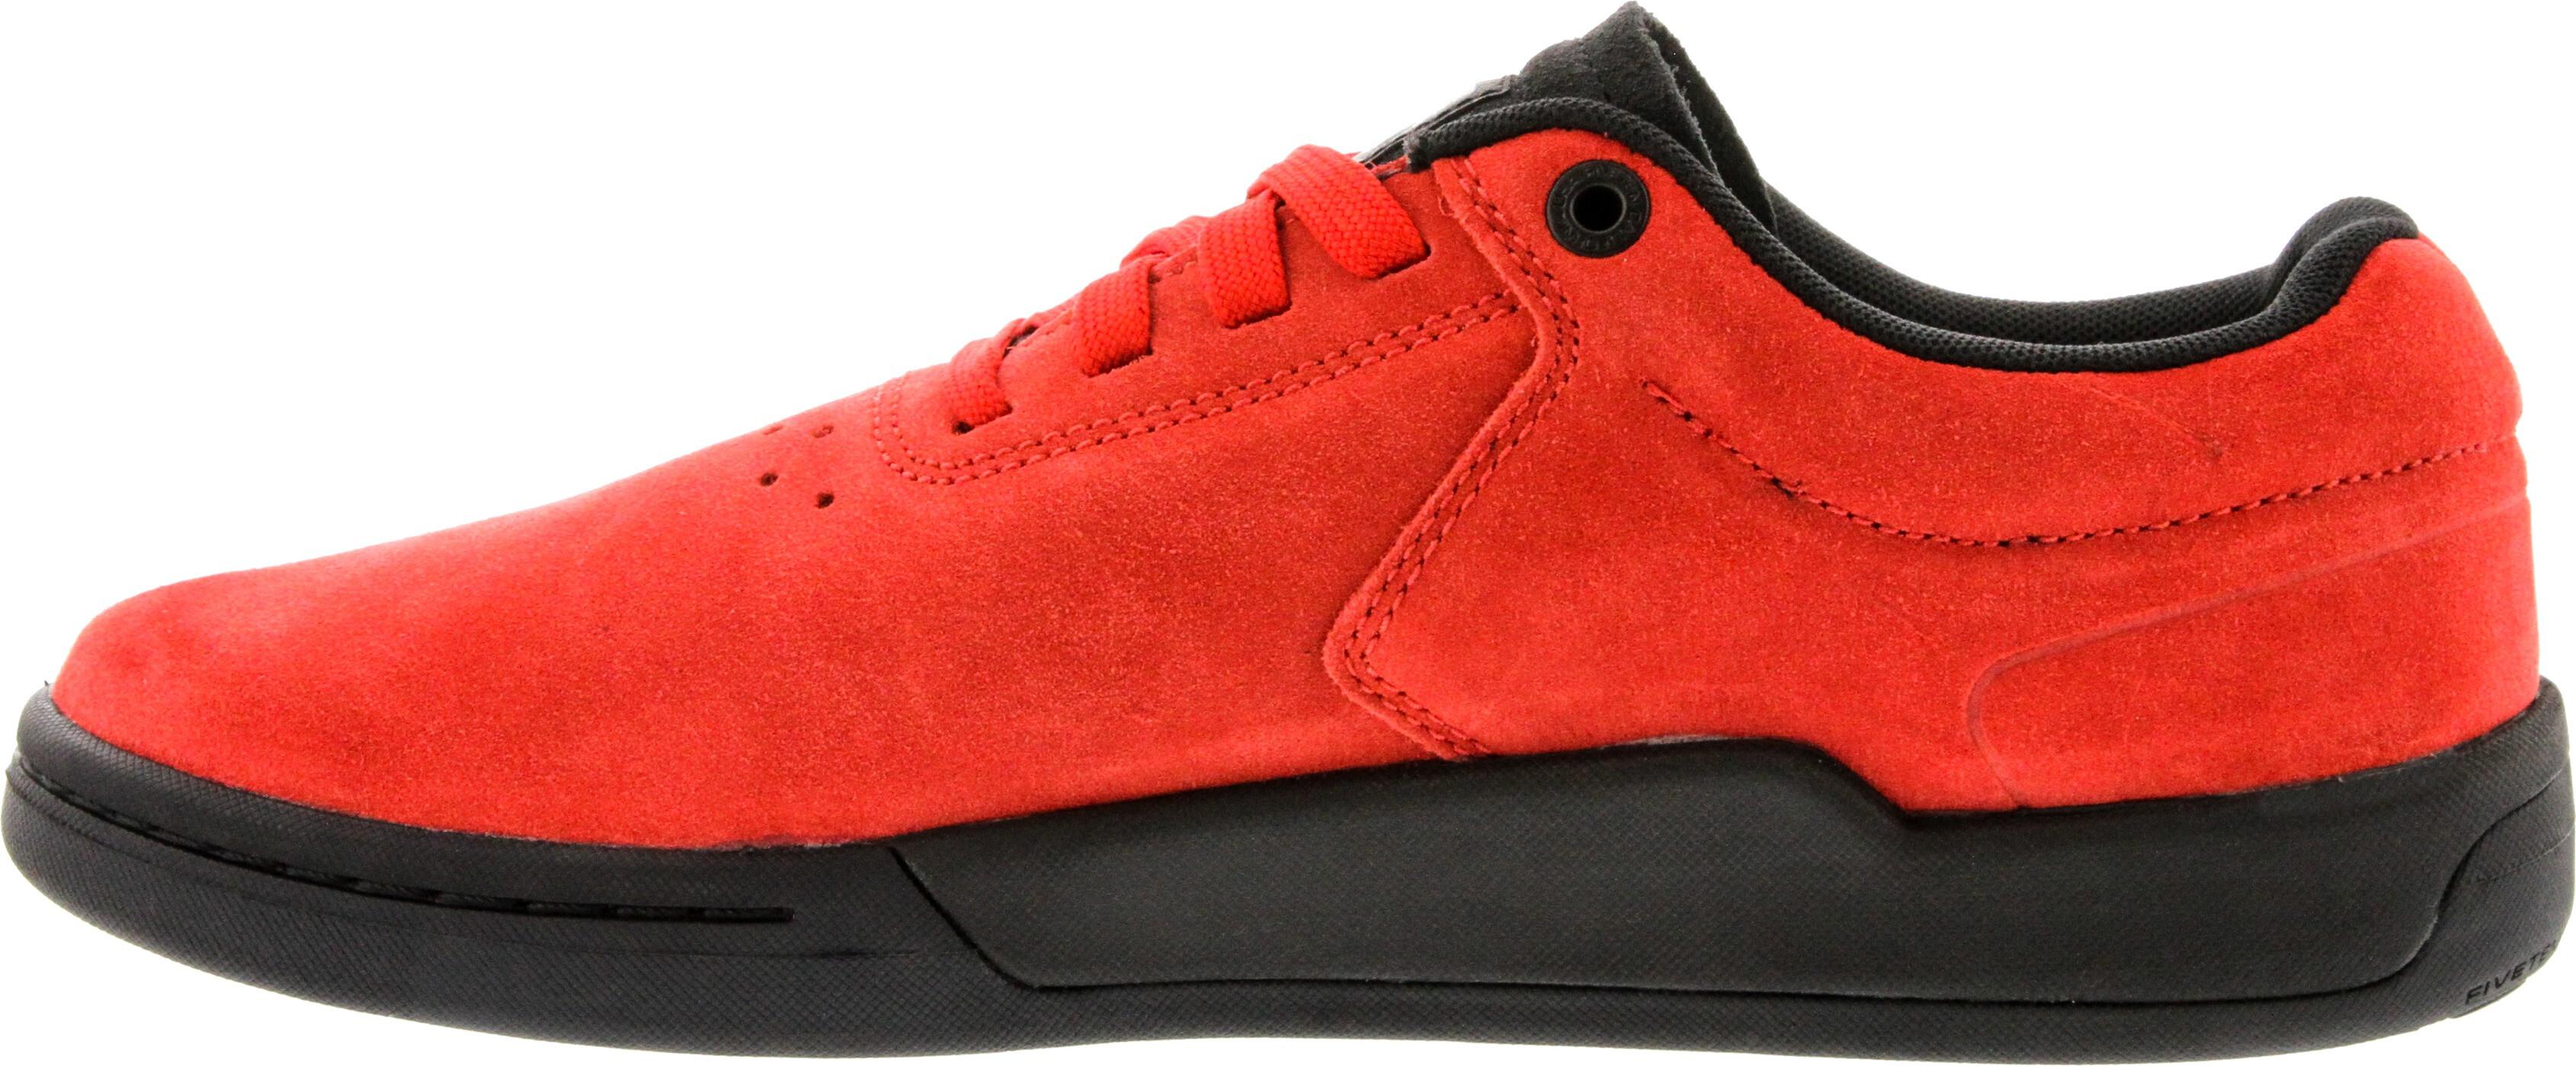 Danny Macaskill  Ten Shoes